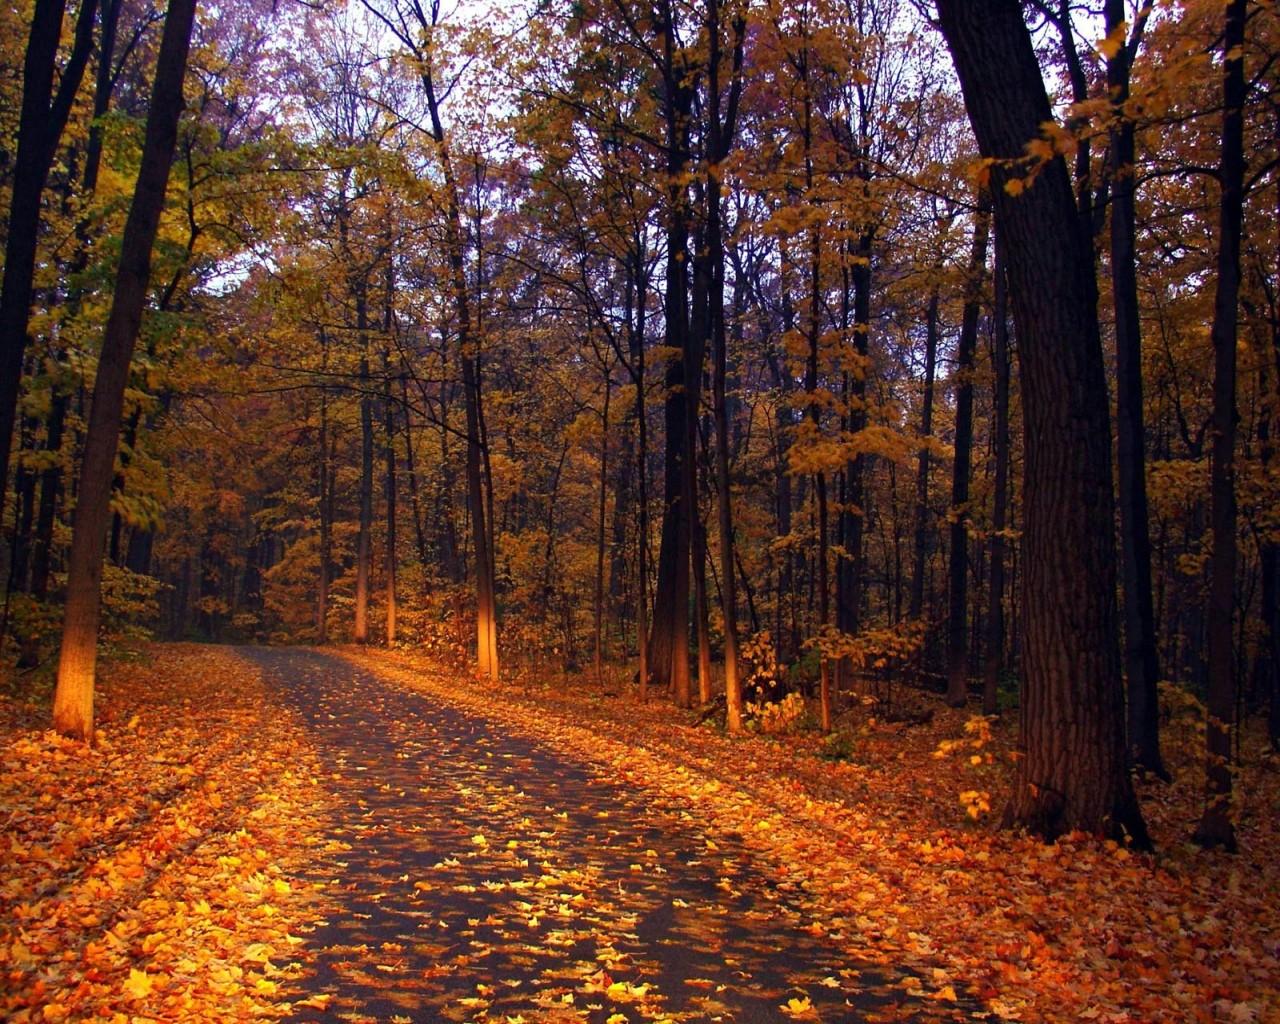 Compartiendo fondos fondos de pantalla paisajes de oto o - Descargar autumn leaves ...